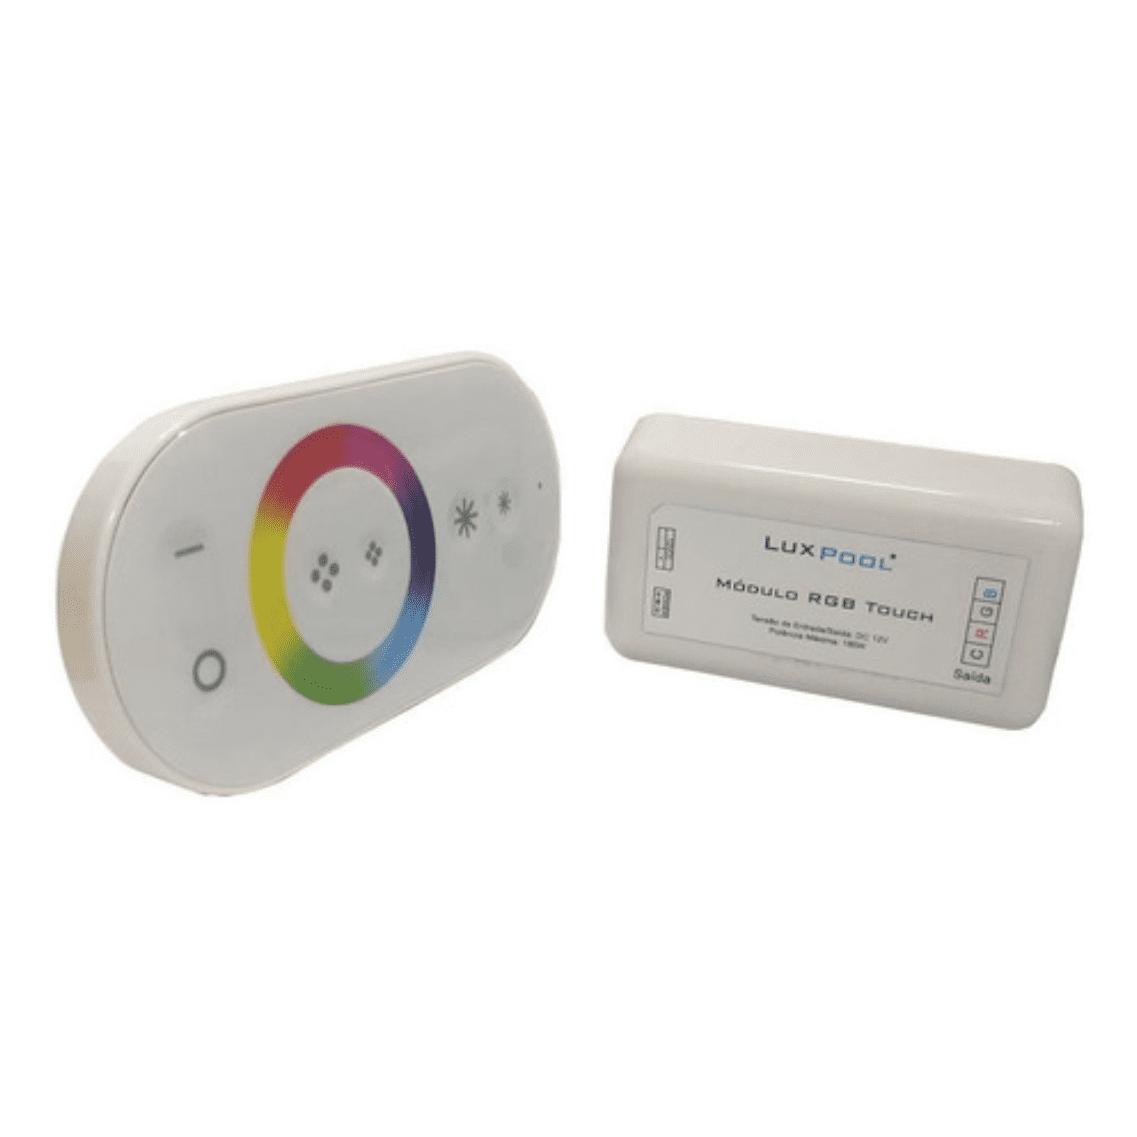 Kit 2 Leds 9W Iluminação Piscina + Módulo Rgb Touch C/ Fonte